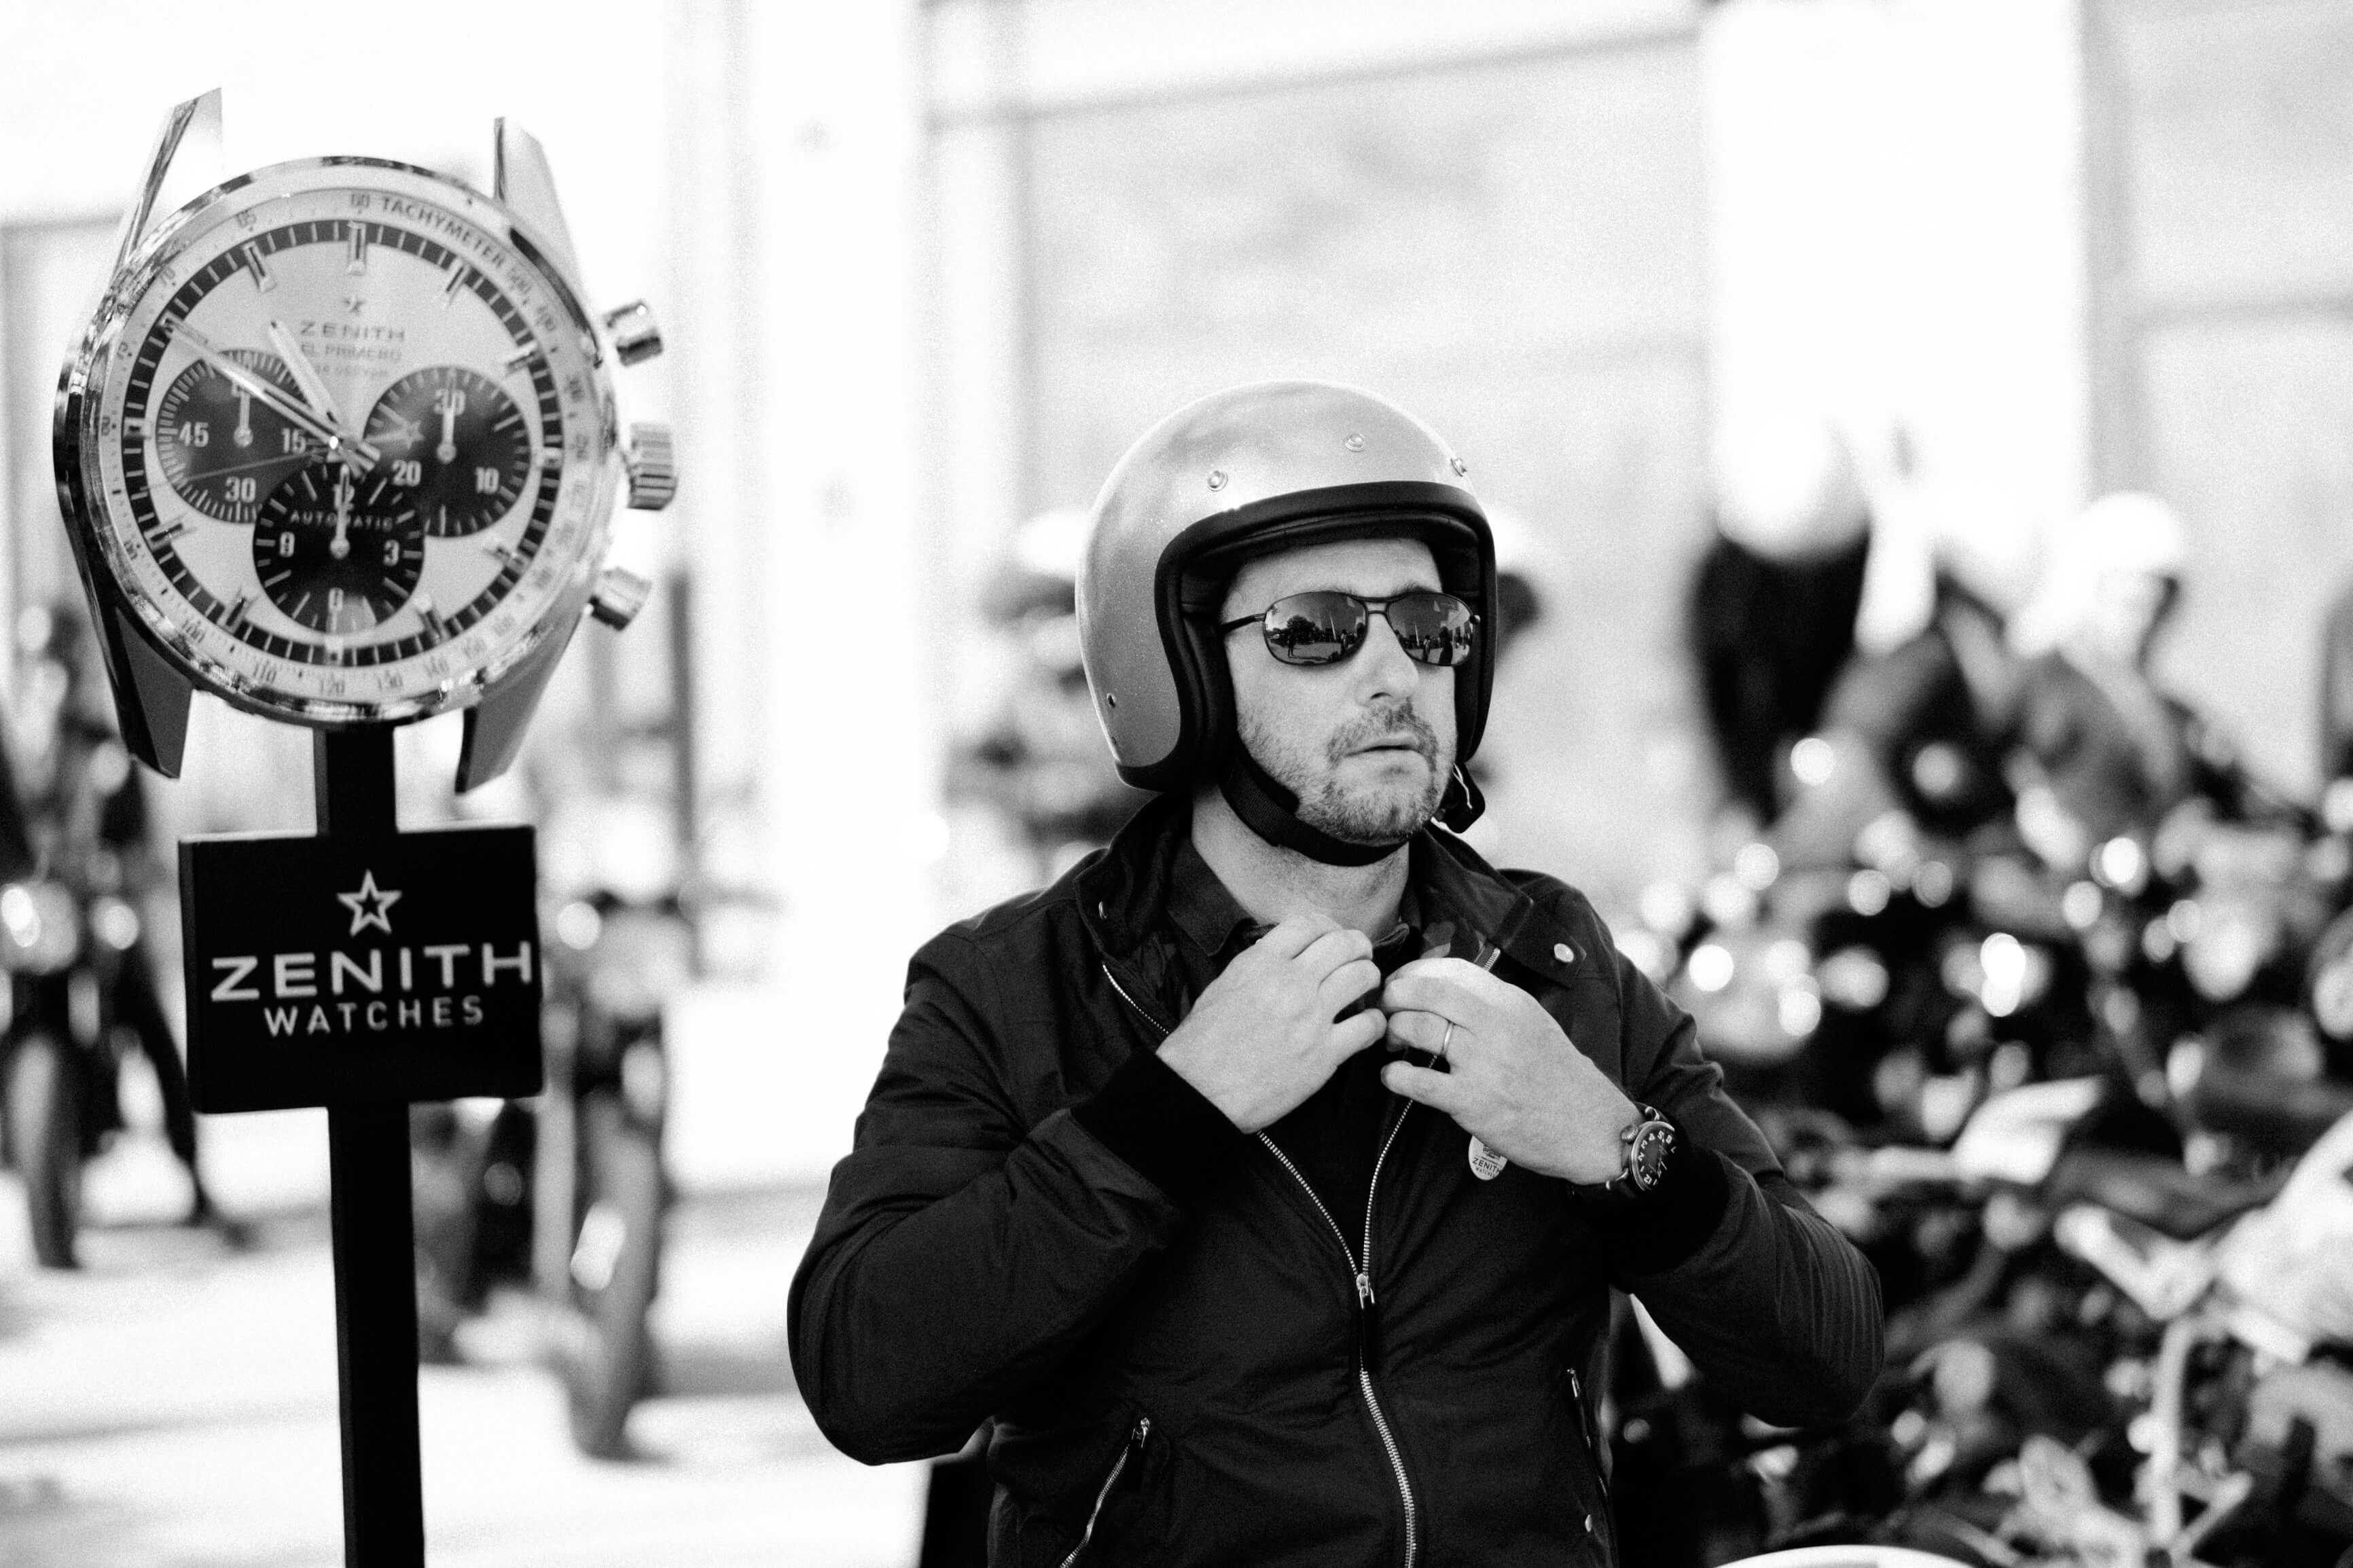 Photo Julien Tornare - DGR Milano 2017 (9)